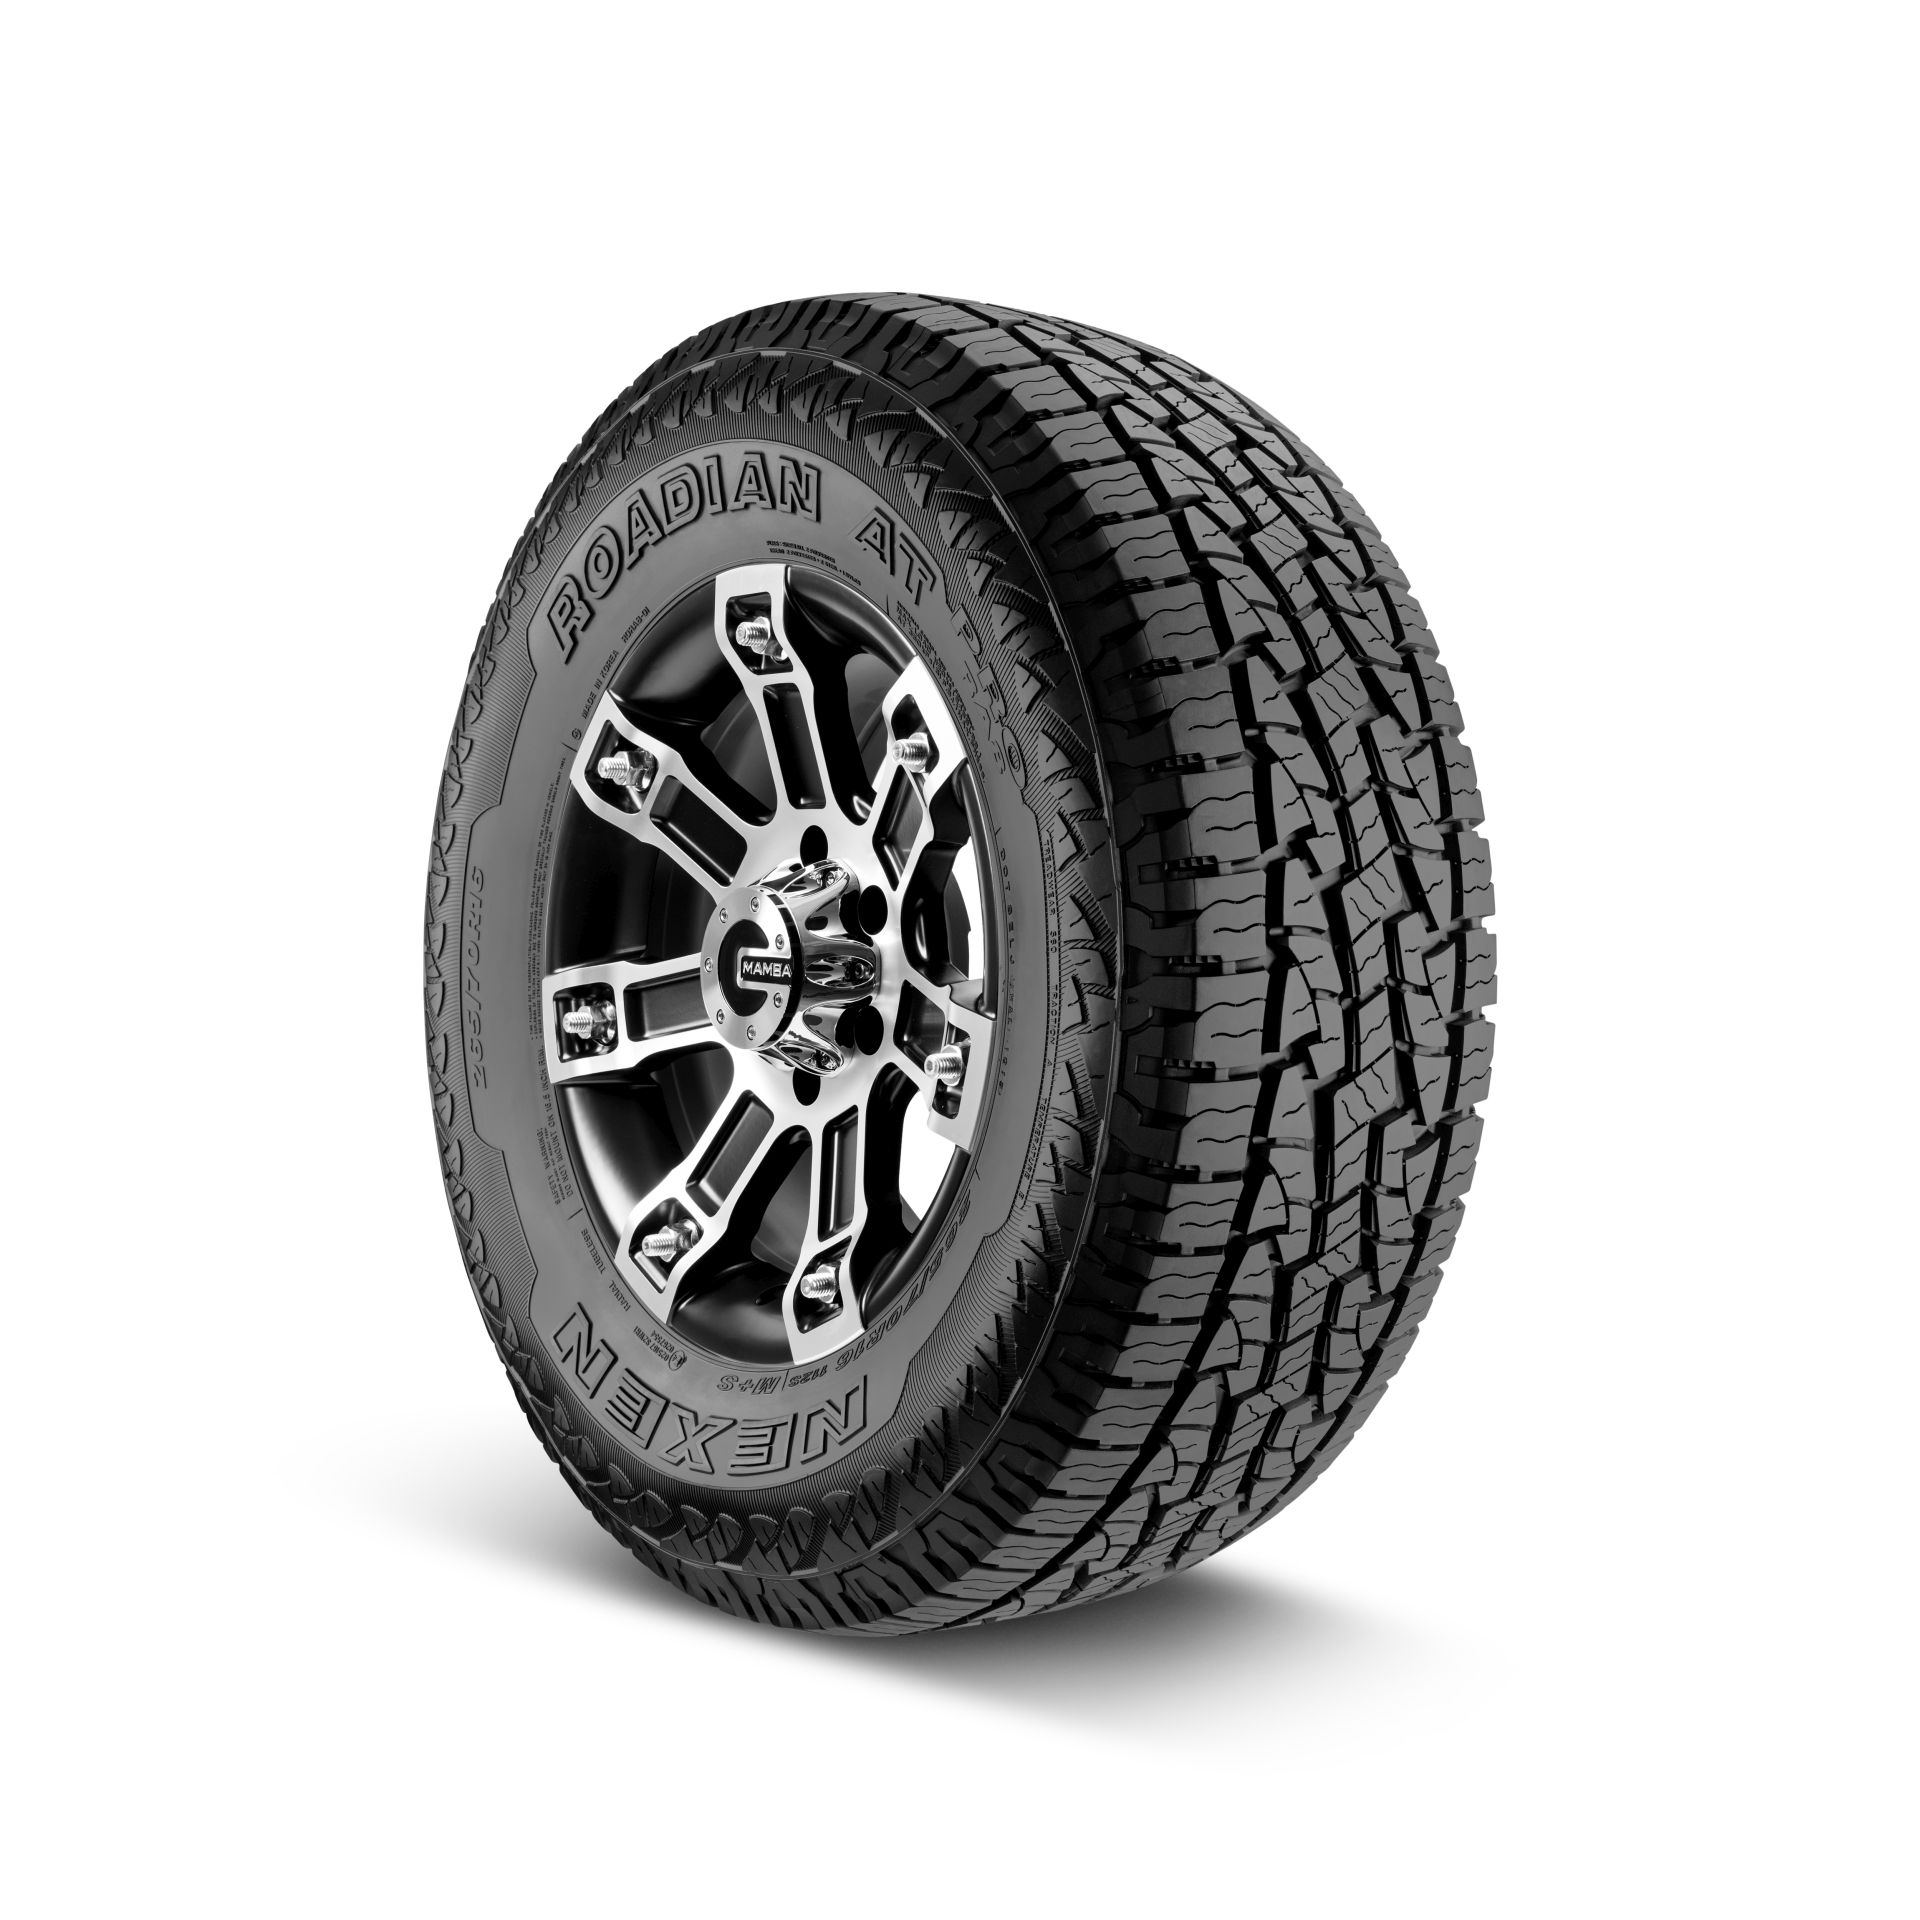 Nexen Offers Roadian AT Pro RA8 for Light Trucks and SUVs